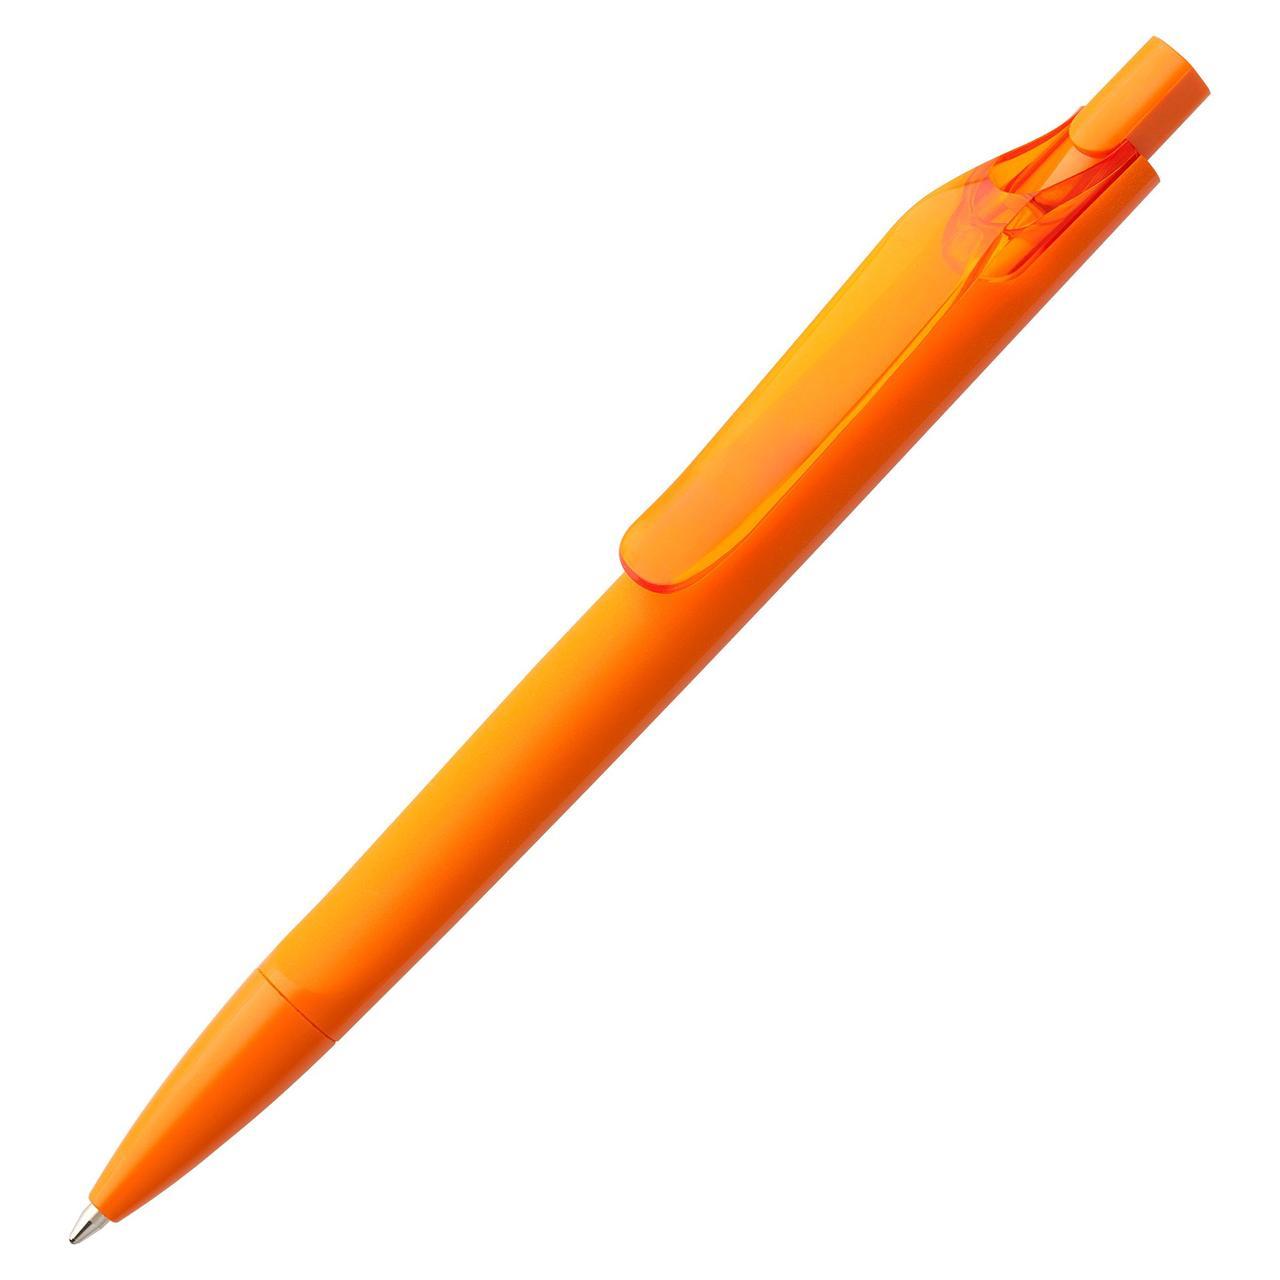 Ручка шариковая Prodir DS6 PPP-T, оранжевая (артикул 3391.20)